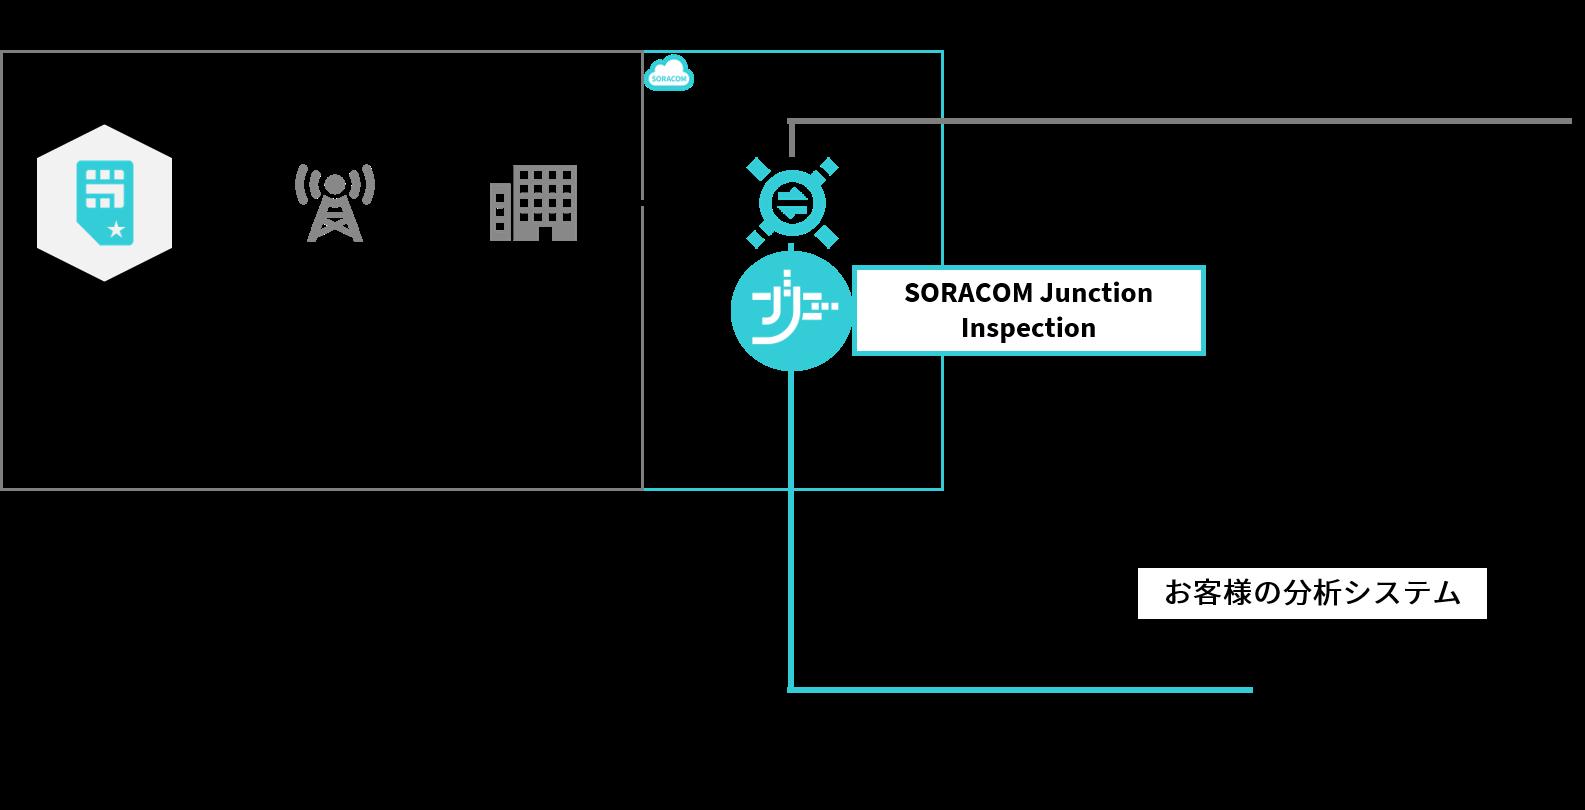 SORACOM Junction Inspection